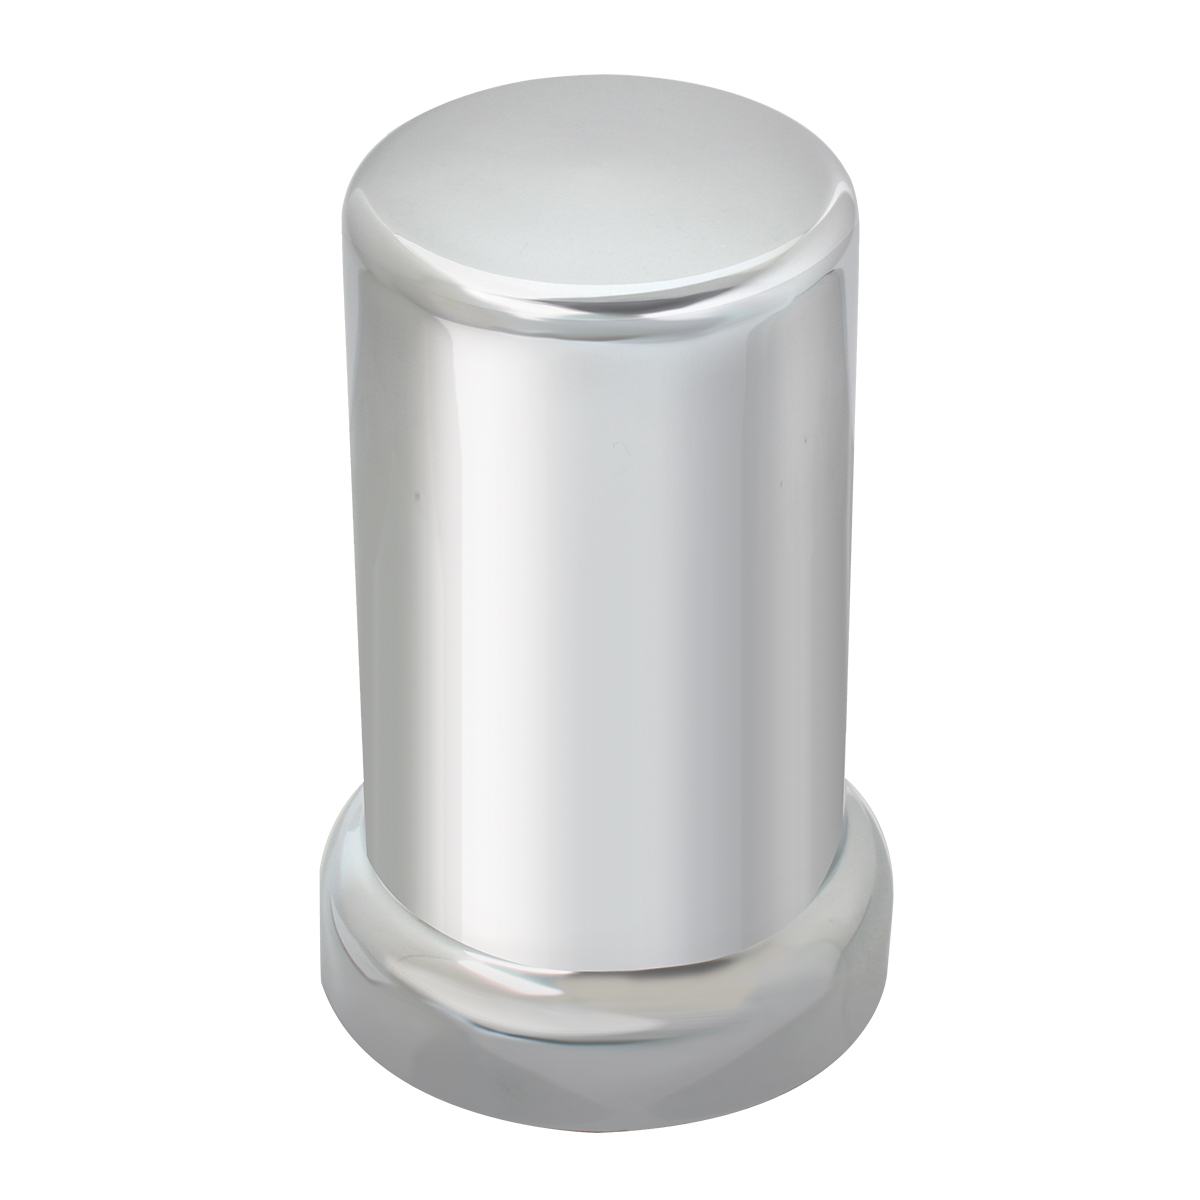 "Tube Chrome Plastic Lug Nut Cover 3-3/8"" (H)"